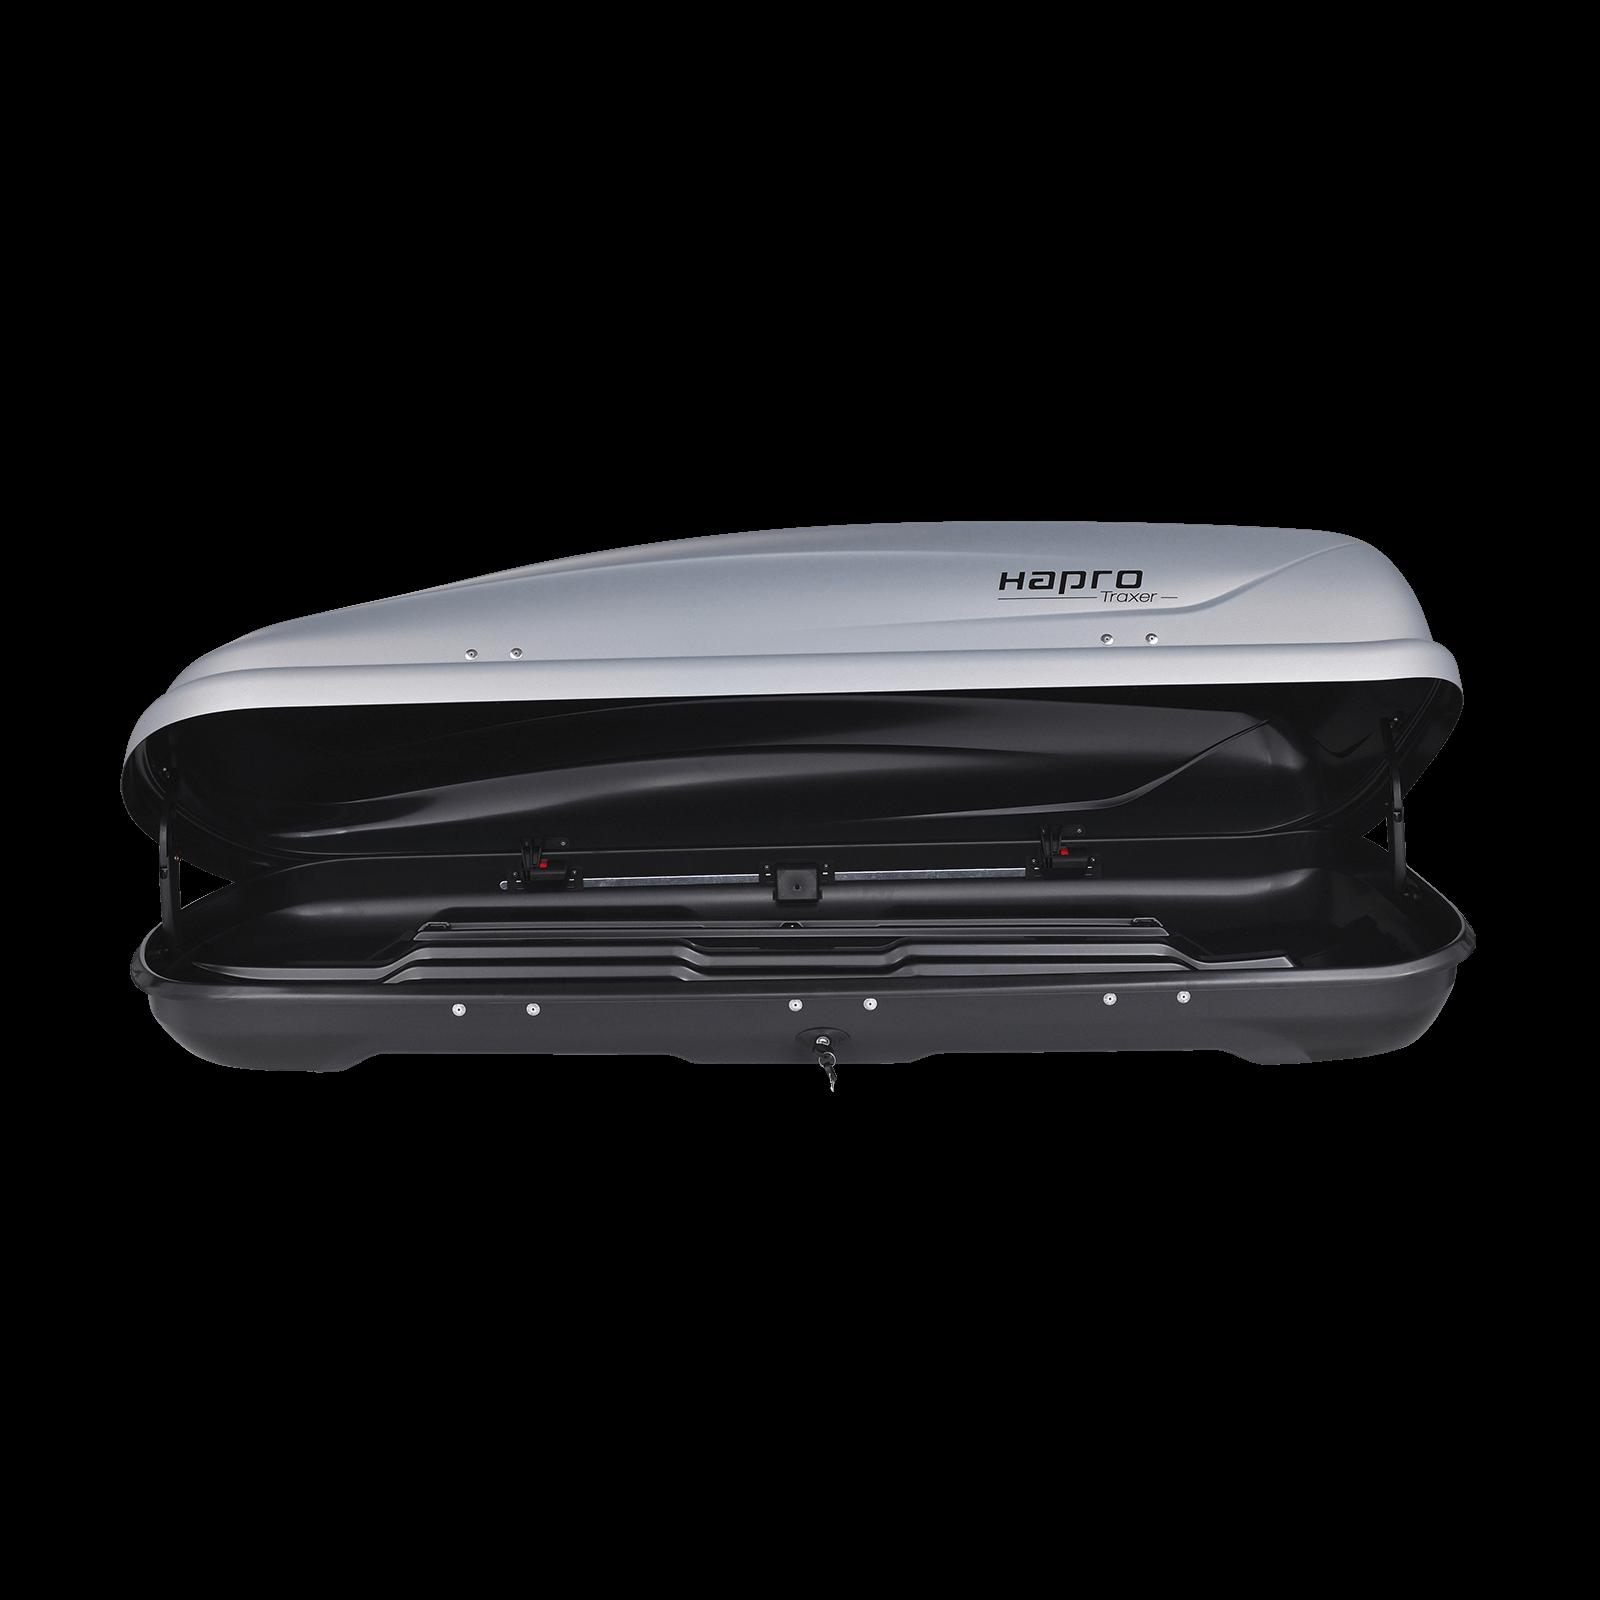 Dachbox Hapro Traxer 5.6 SilverGrey - Bild 2